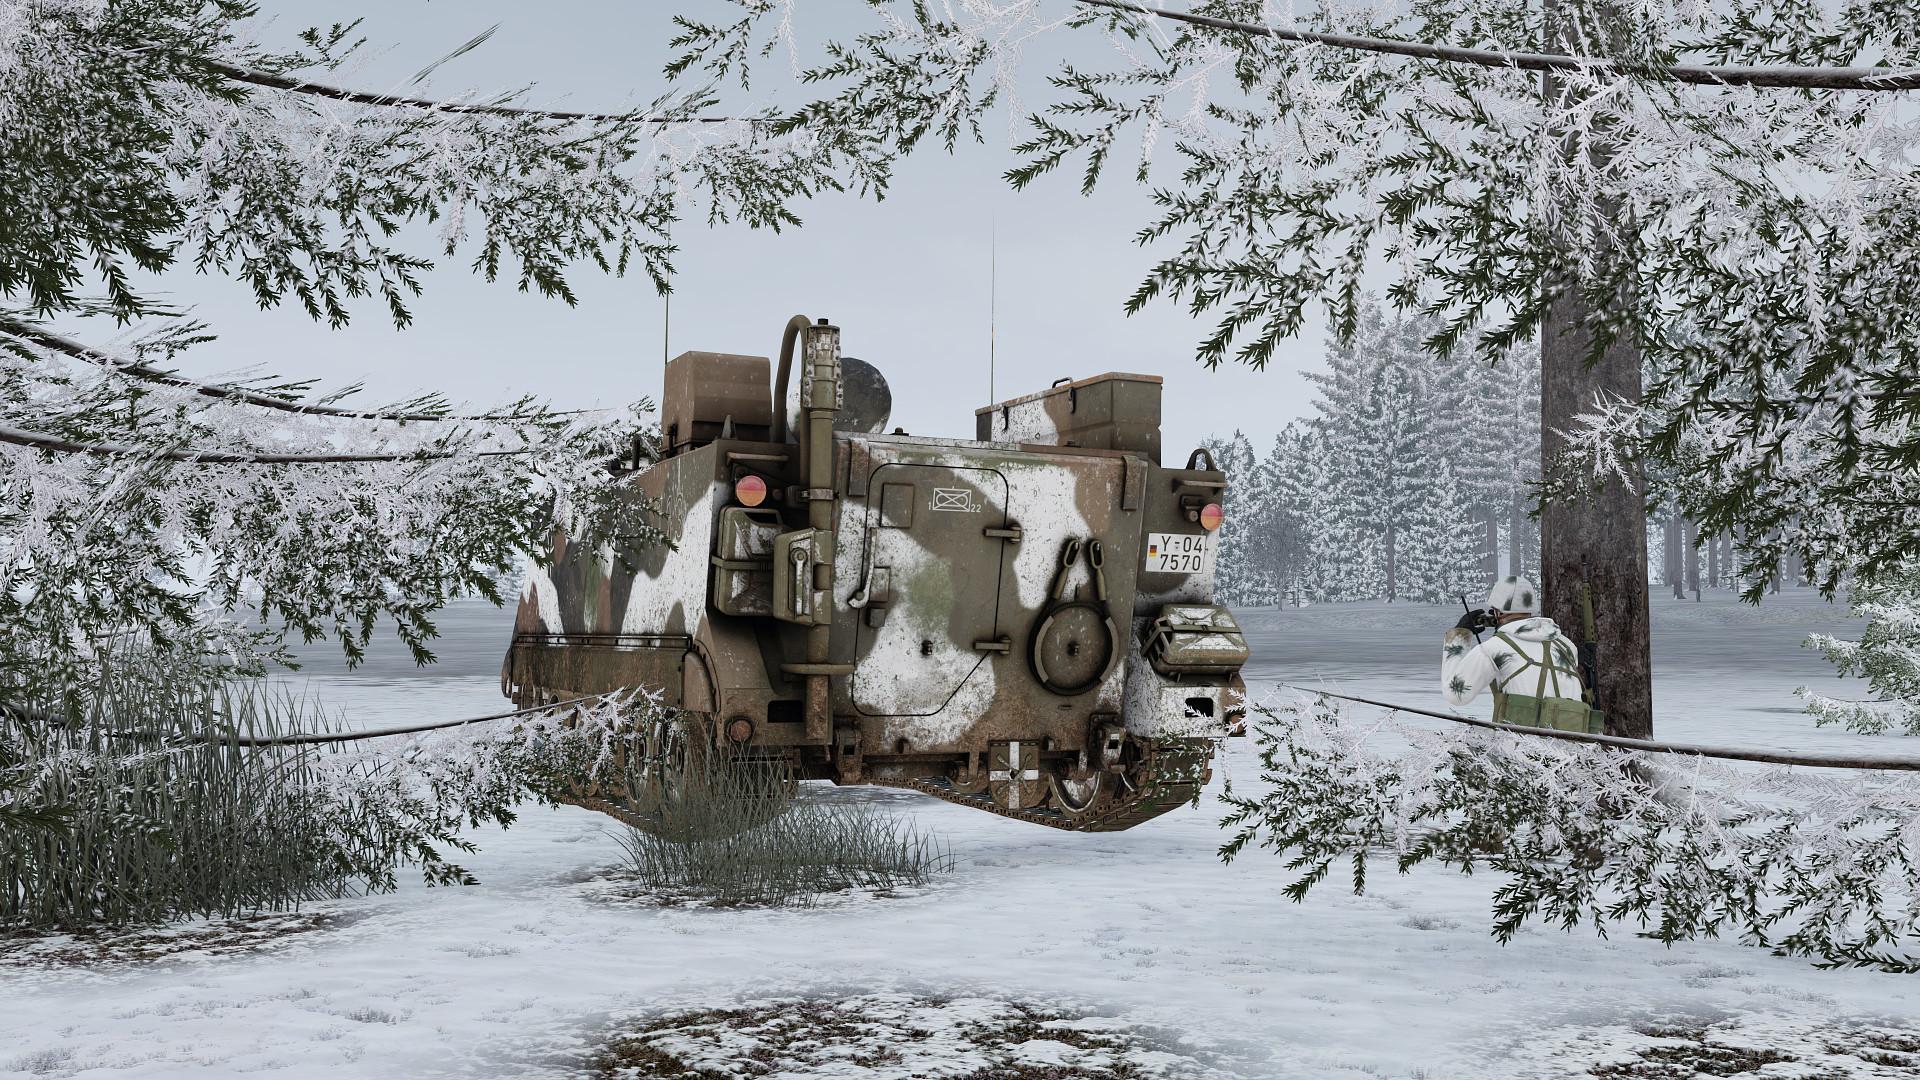 New arma 3 cold war DLC - Altis Chat - Grand Theft ArmA - The Altis